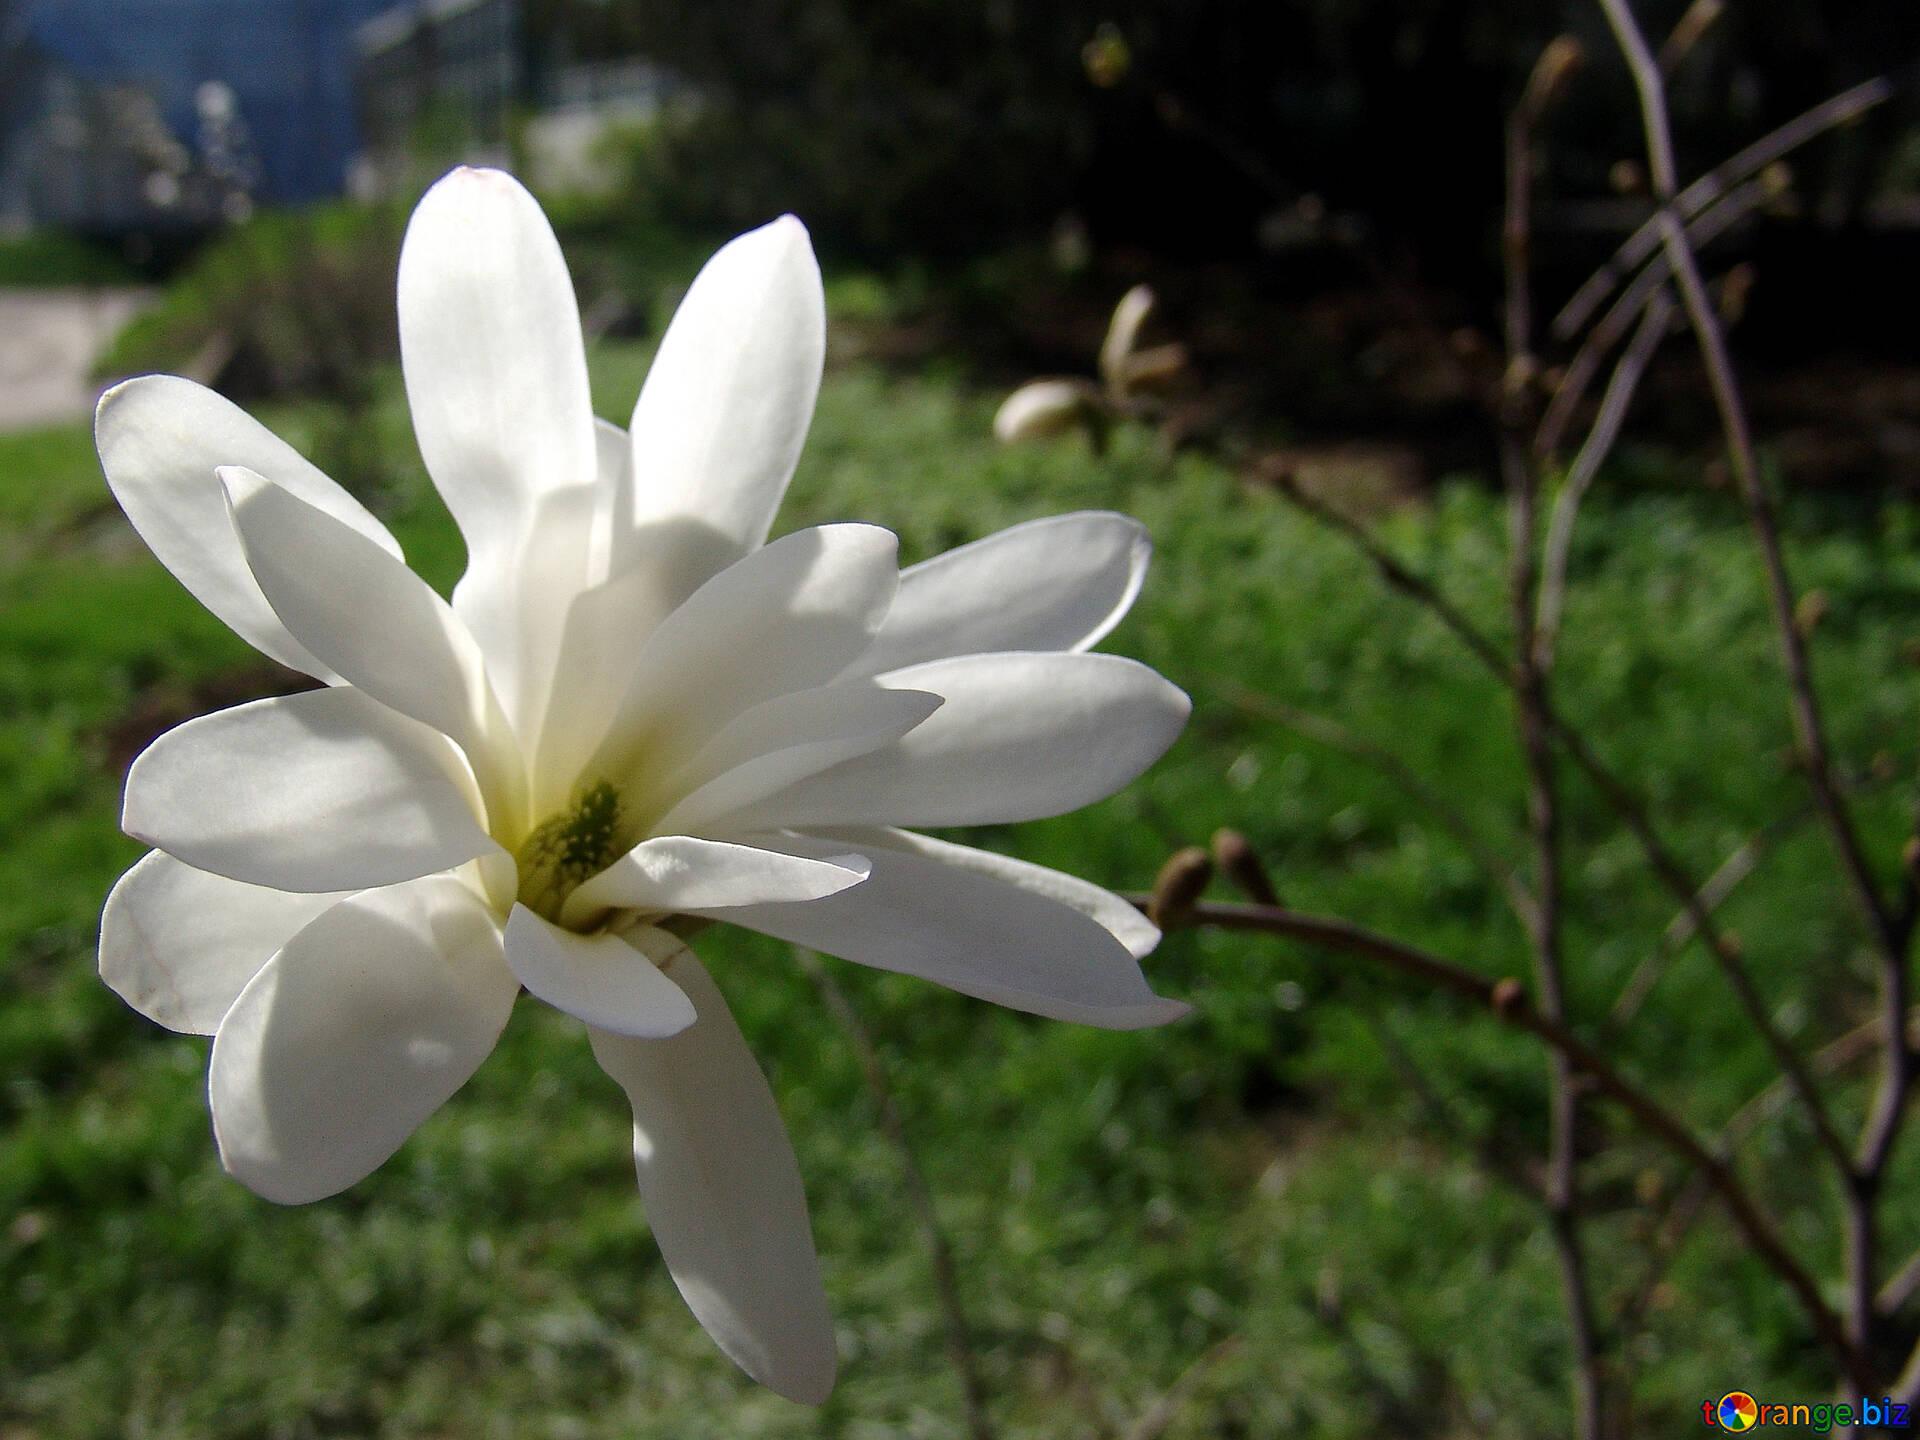 White Magnolia White Magnolia Flower Park 536